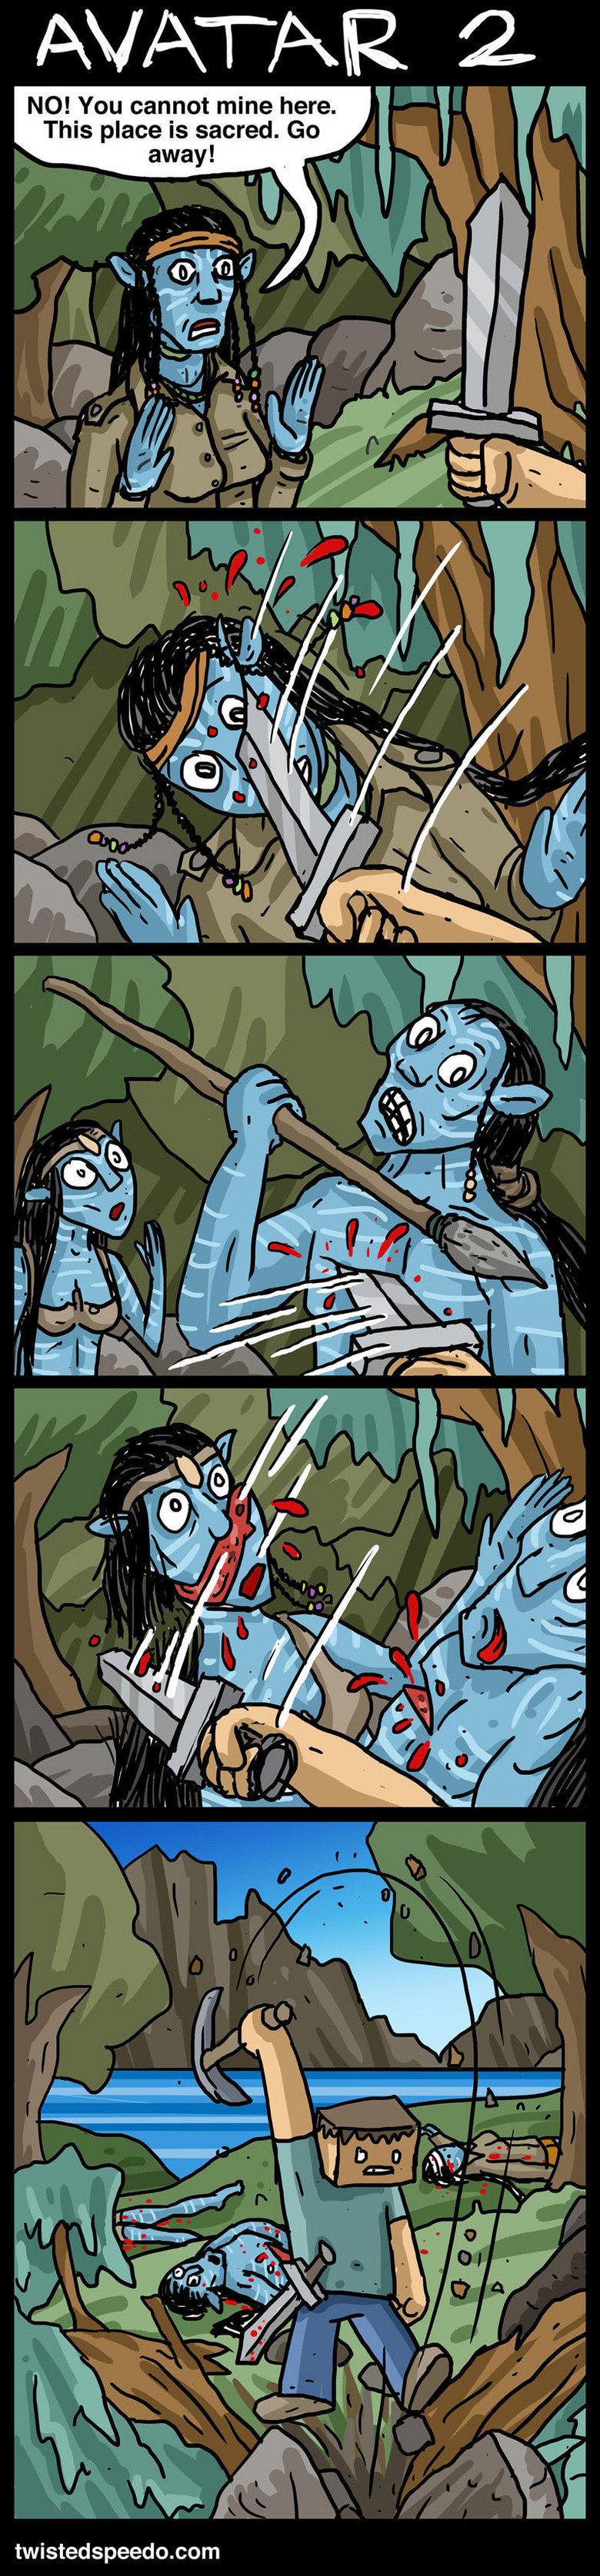 http://img.niceminecraft.net/Funny/Avatar-2.jpg